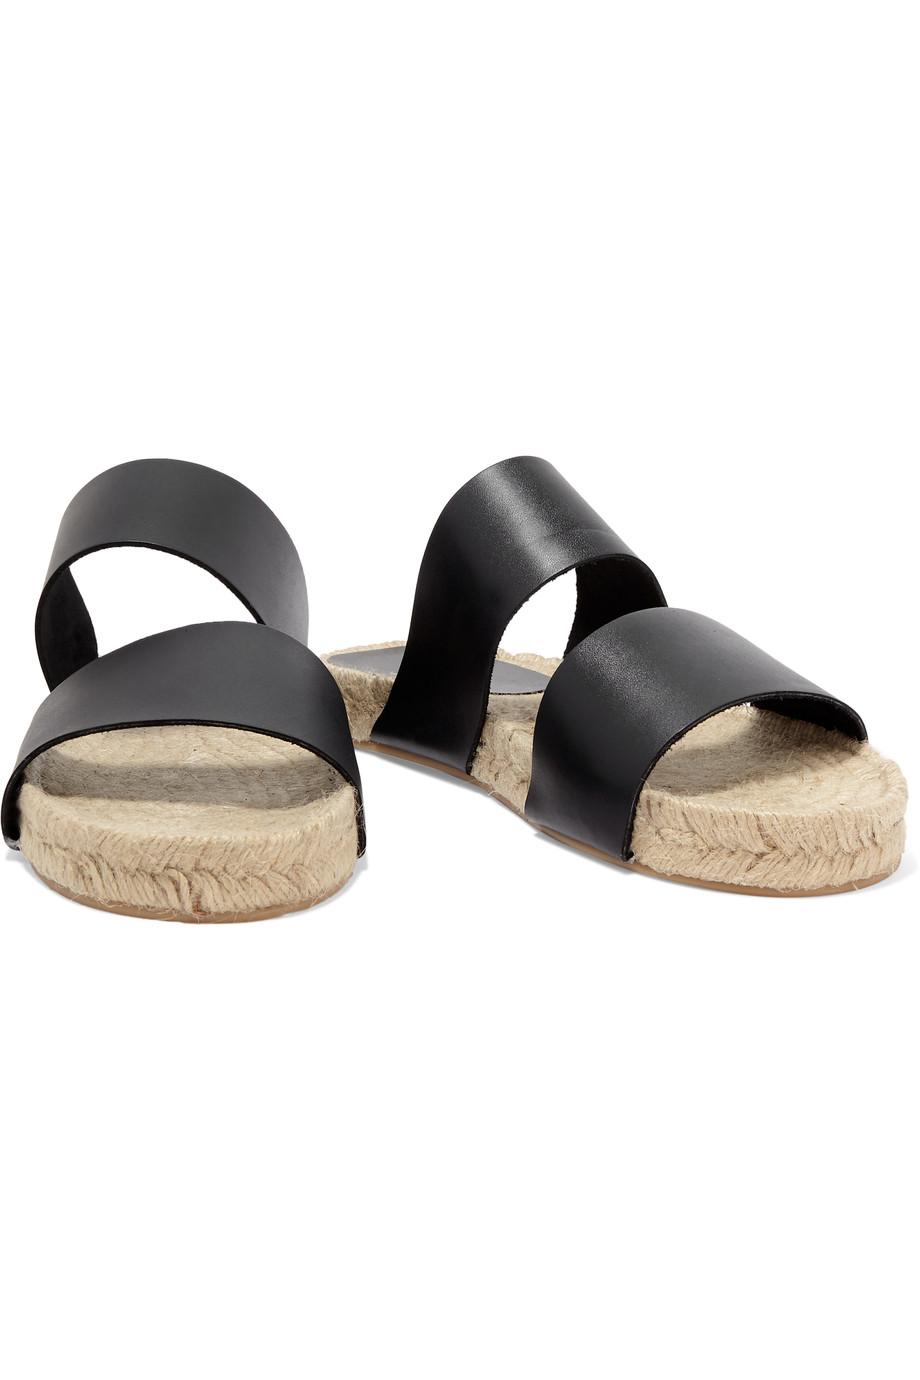 Iris & Ink / Hudson Leather Slides